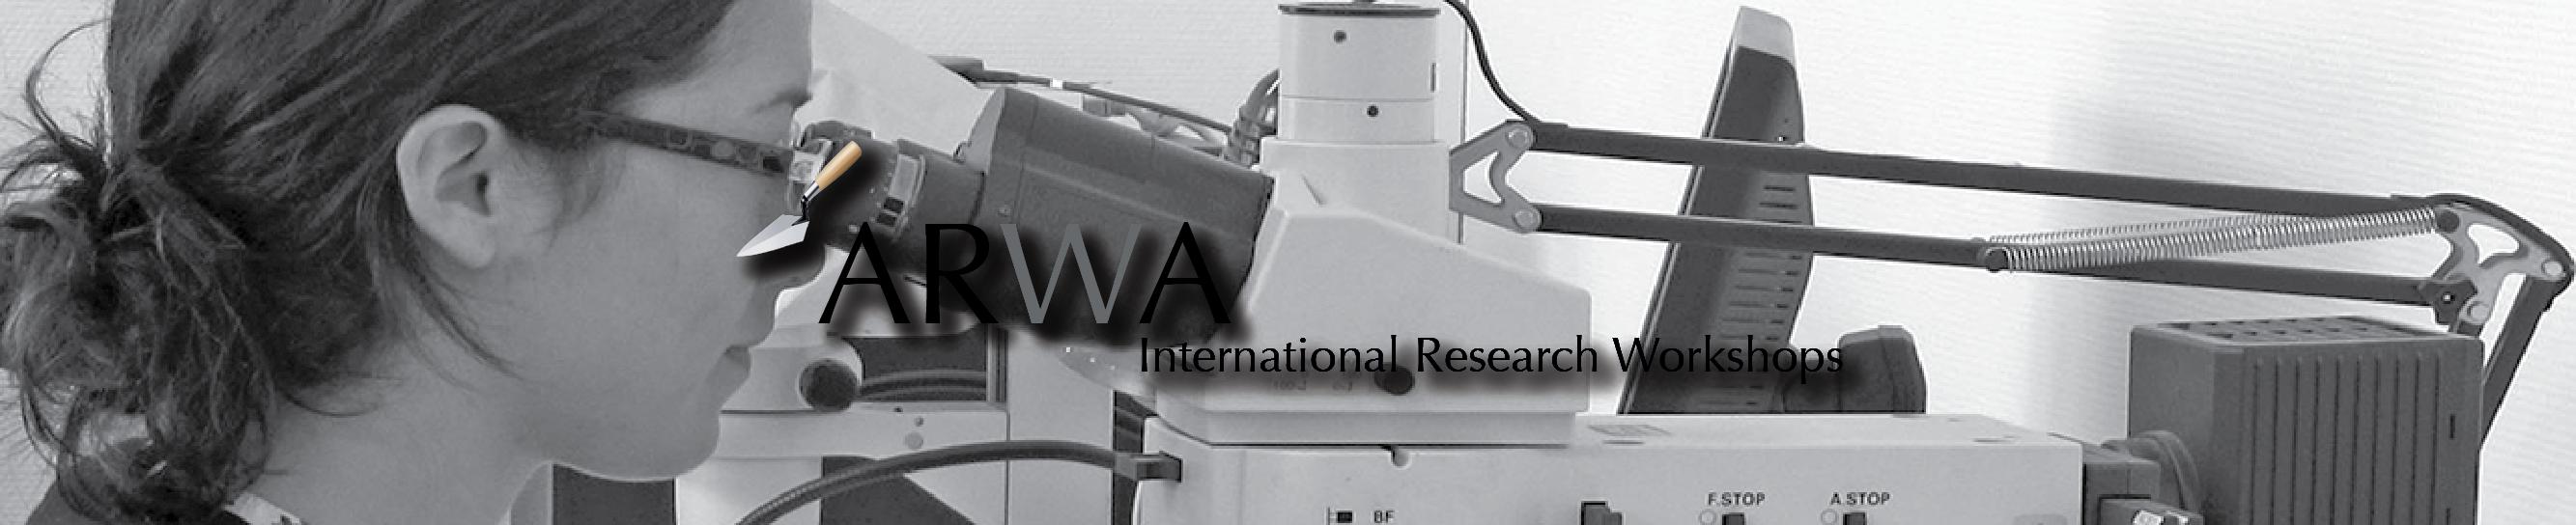 ARWA Research Workshops